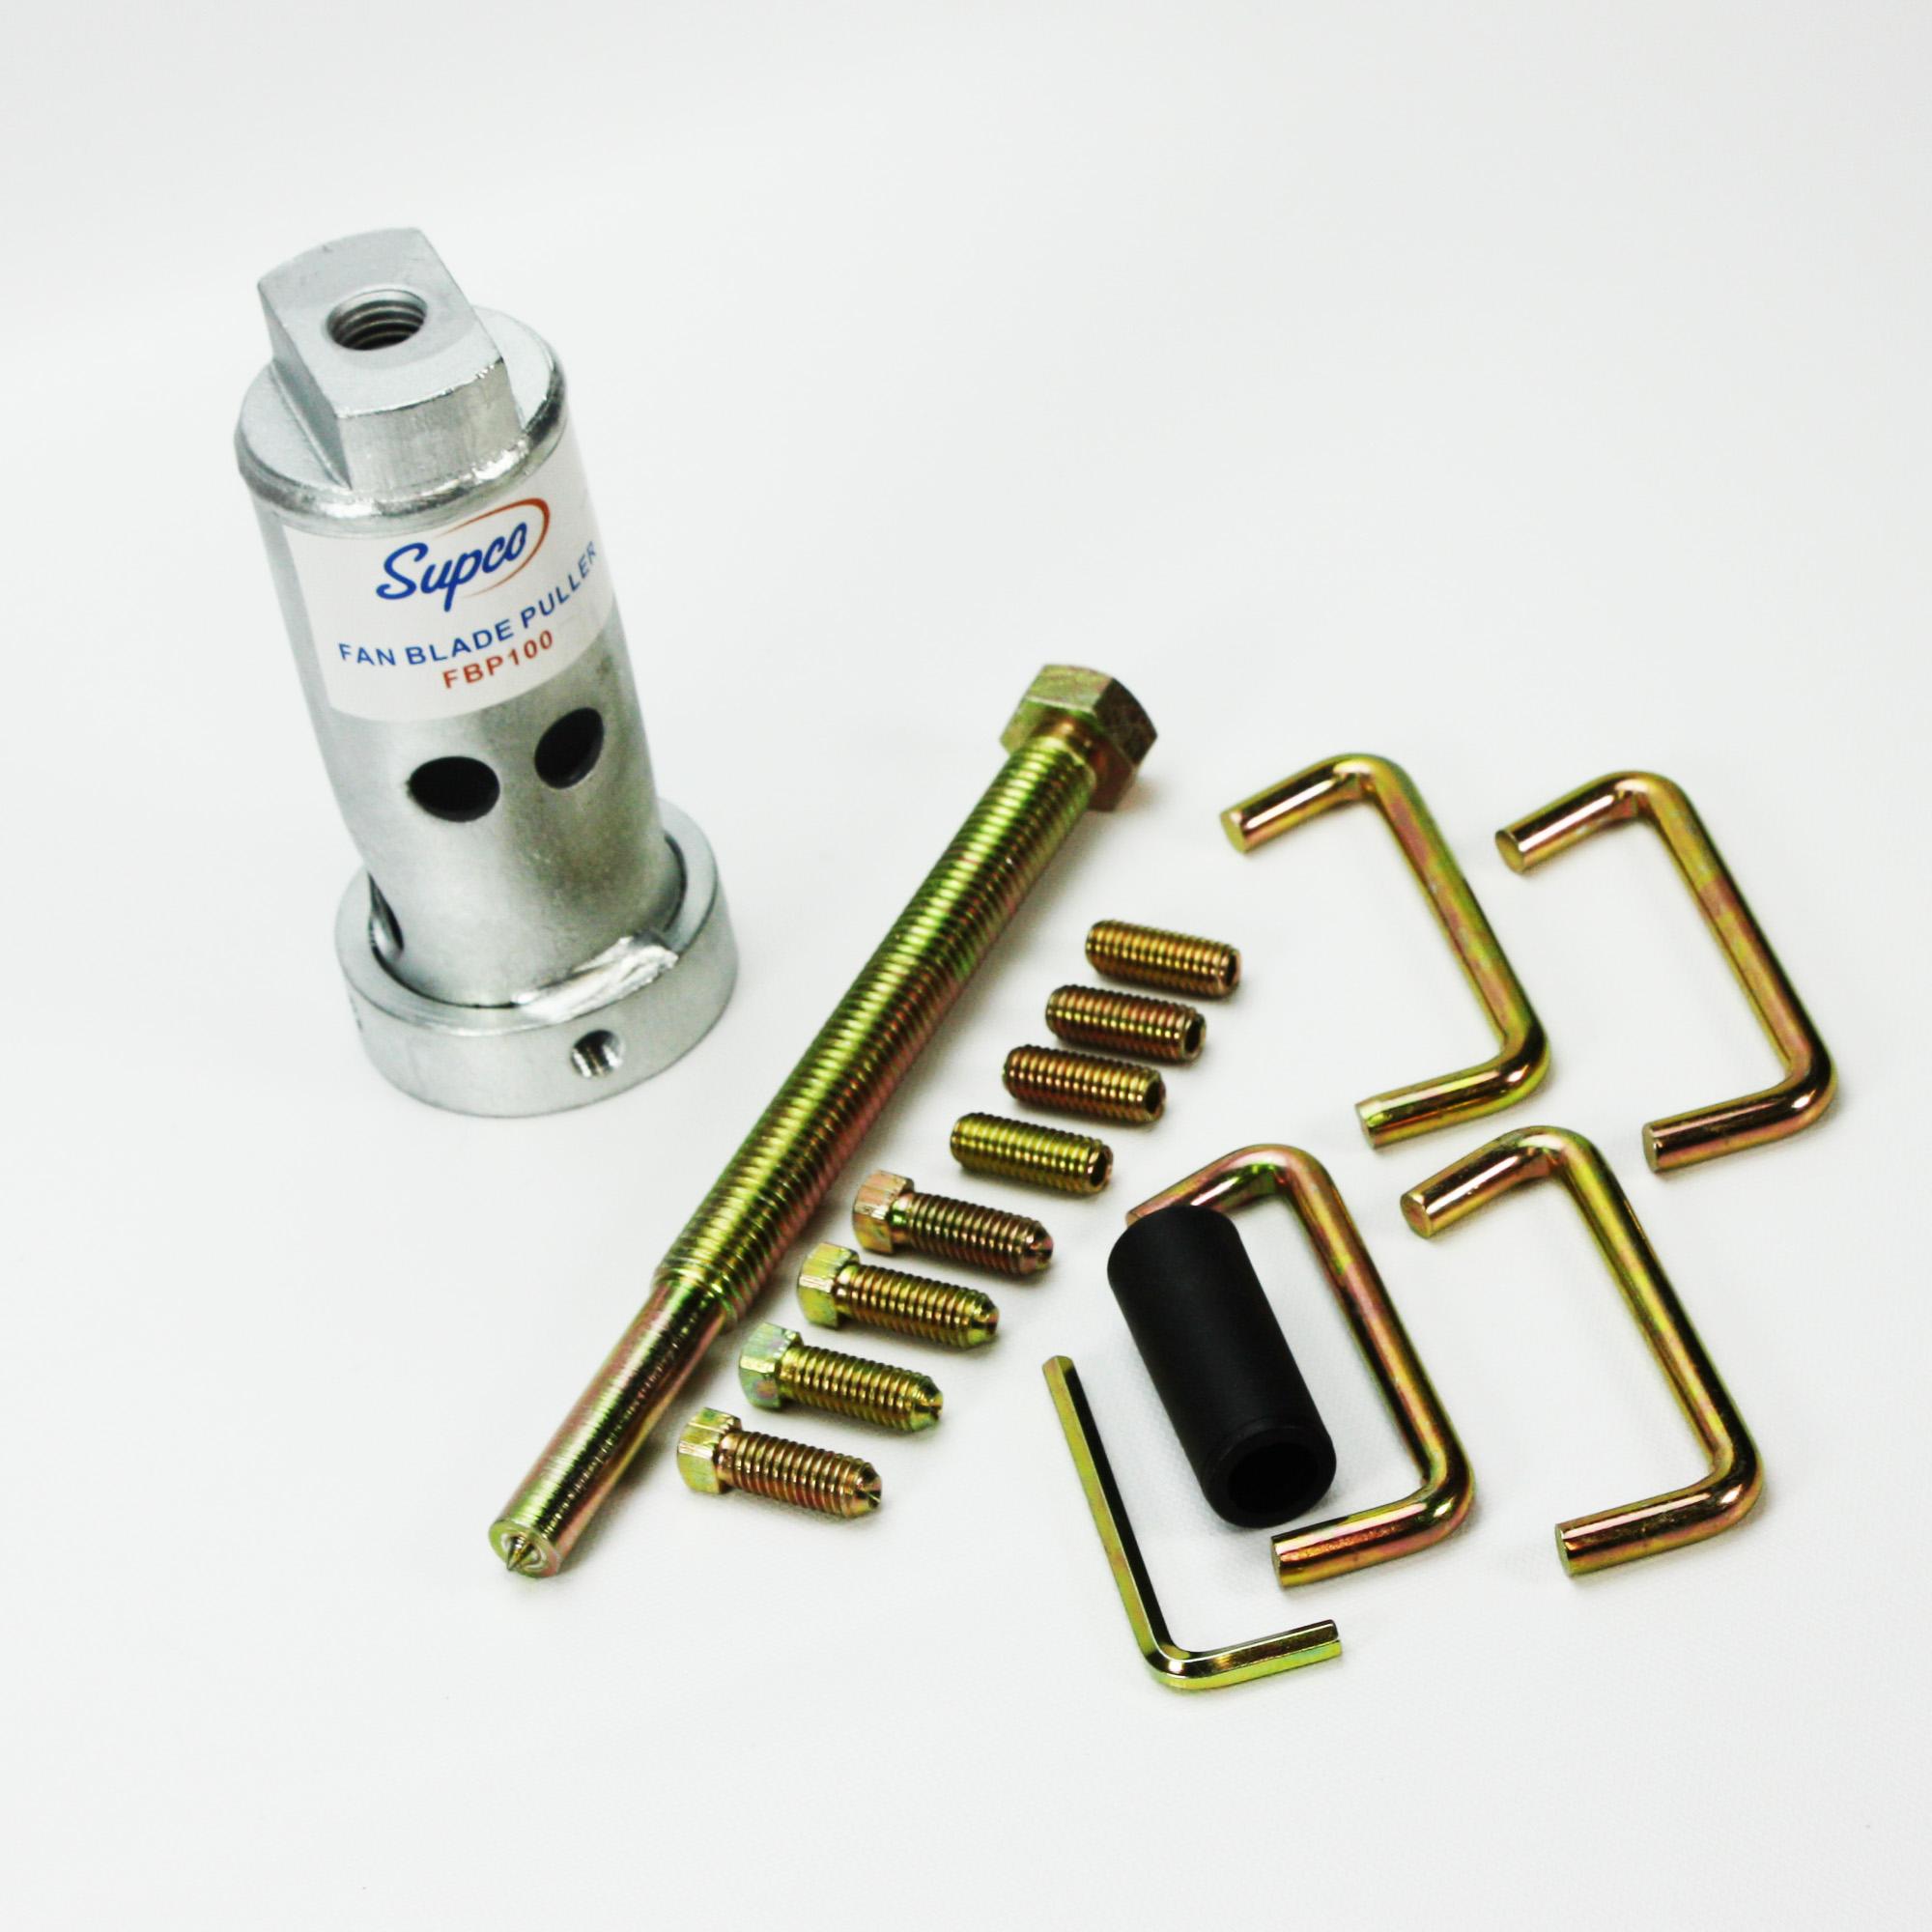 Hvac Fan Blade : Fbp hvac condenser blower fan blade puller tool kit